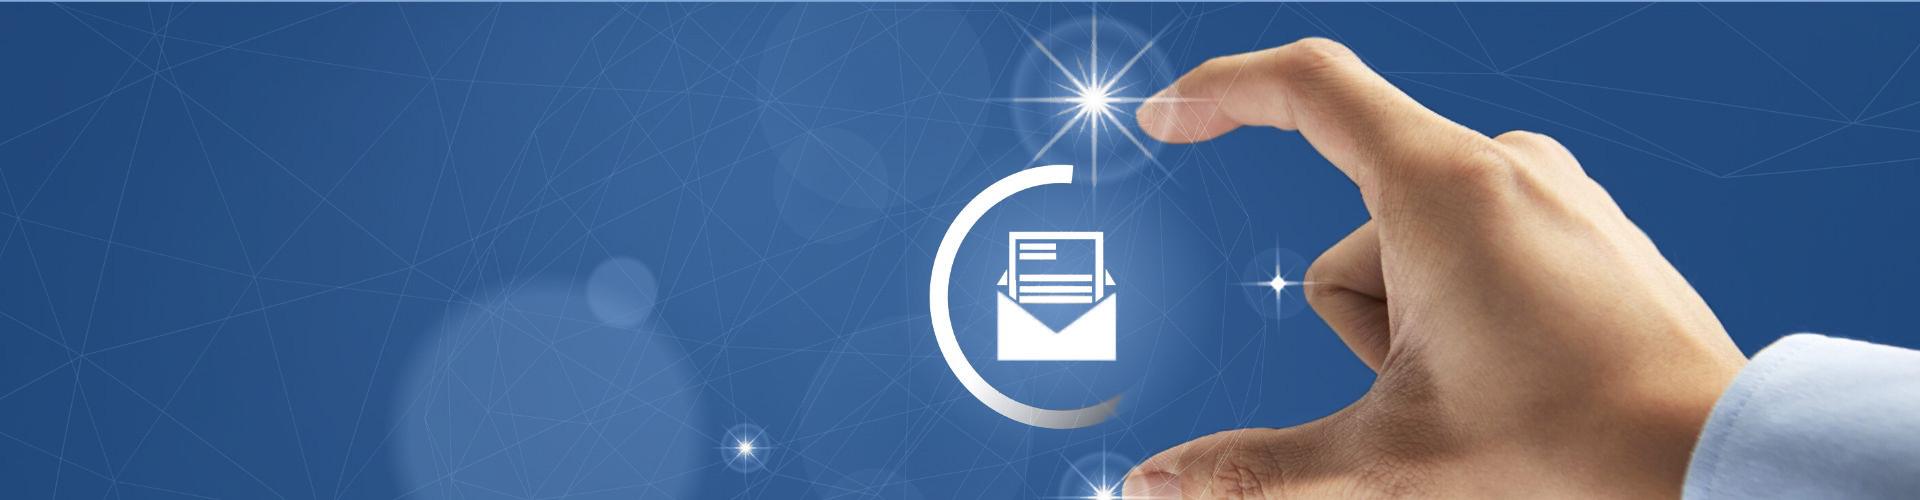 Mailbox opruimen tips